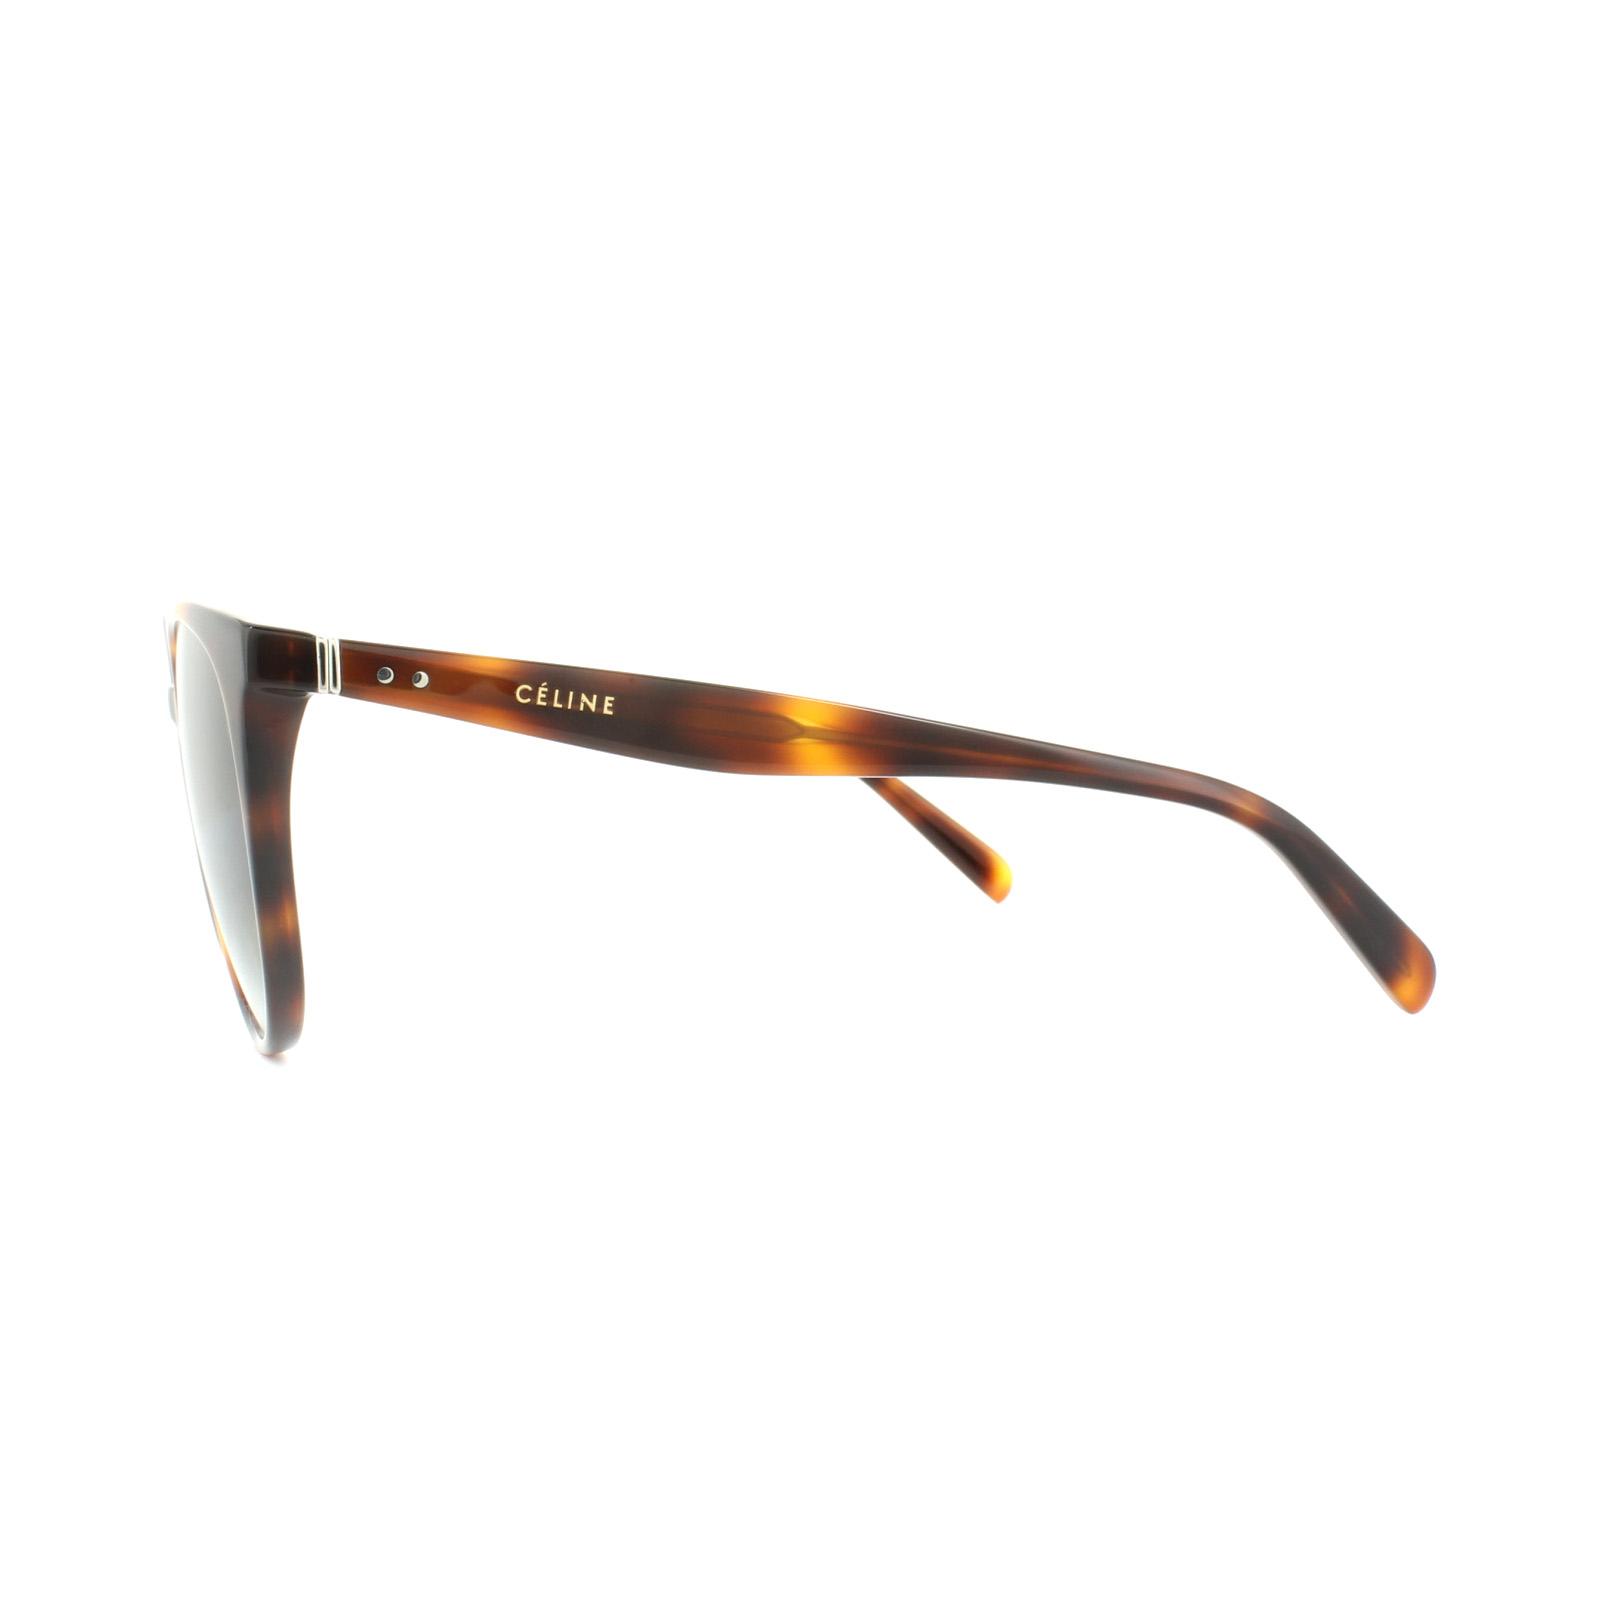 05de1a3143f Sentinel Celine Sunglasses 41068 S Thin Mary 05L XM Havana Green Gradient